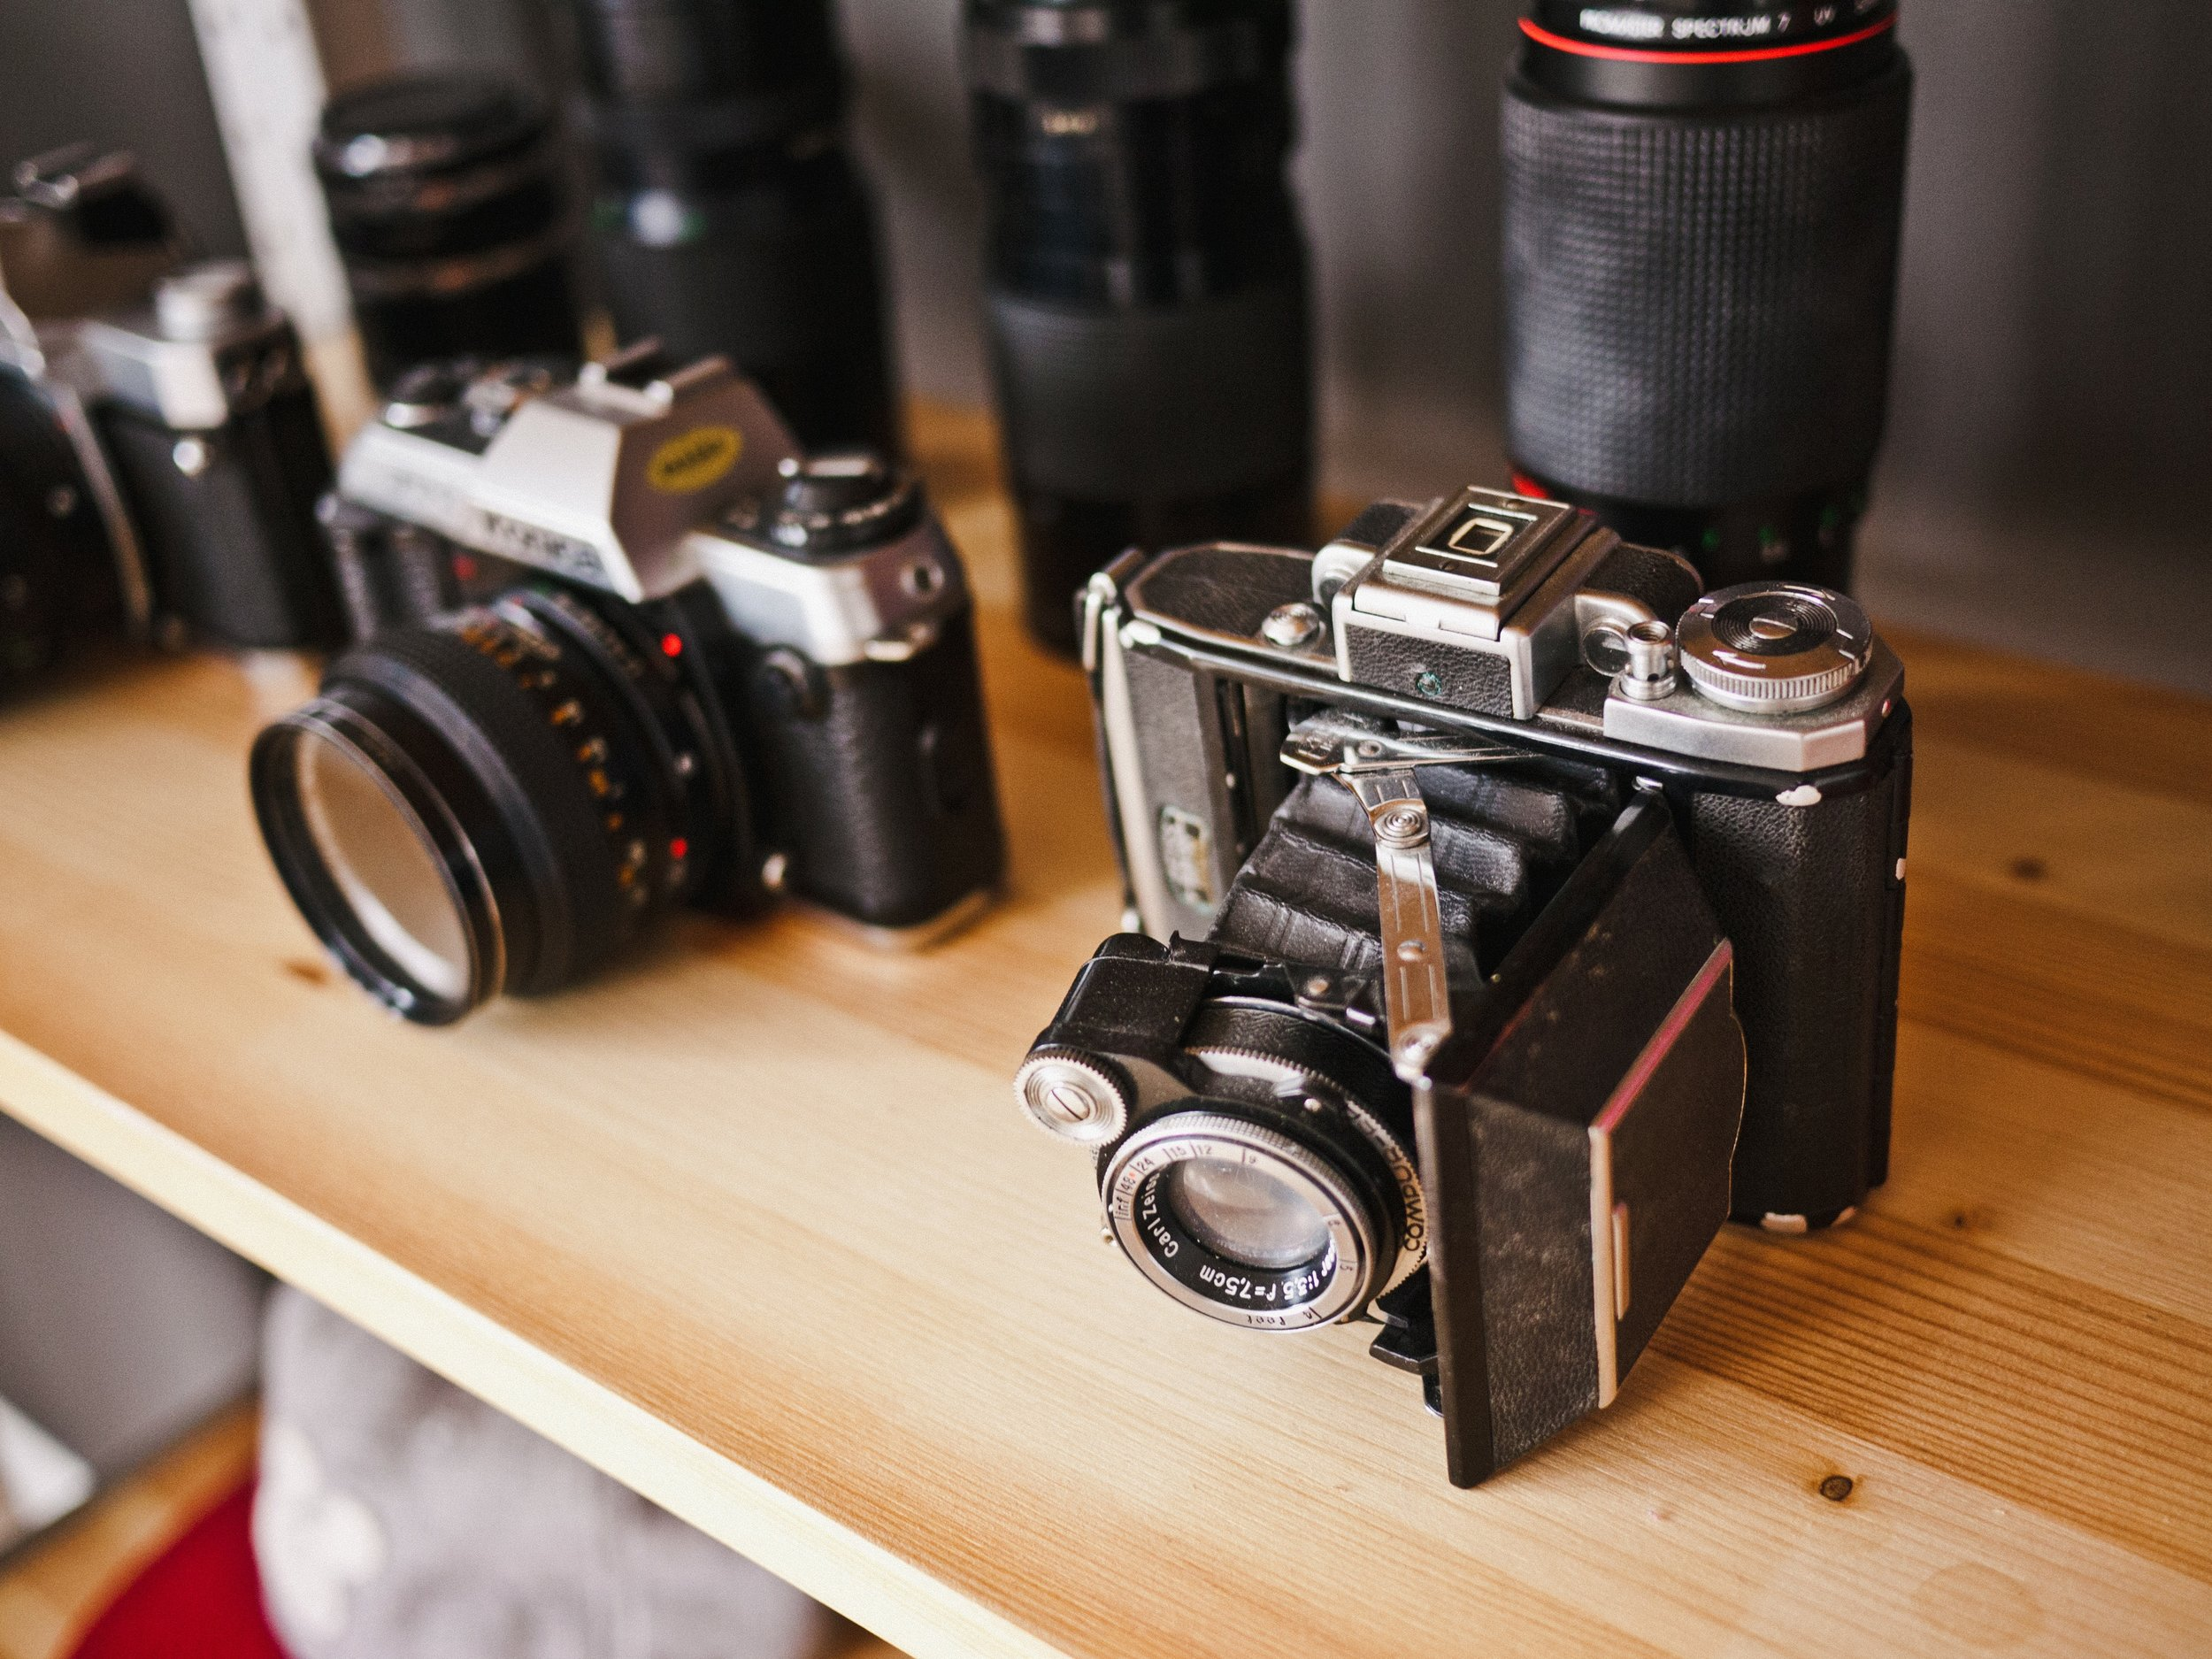 Vintage cameras on a shelf